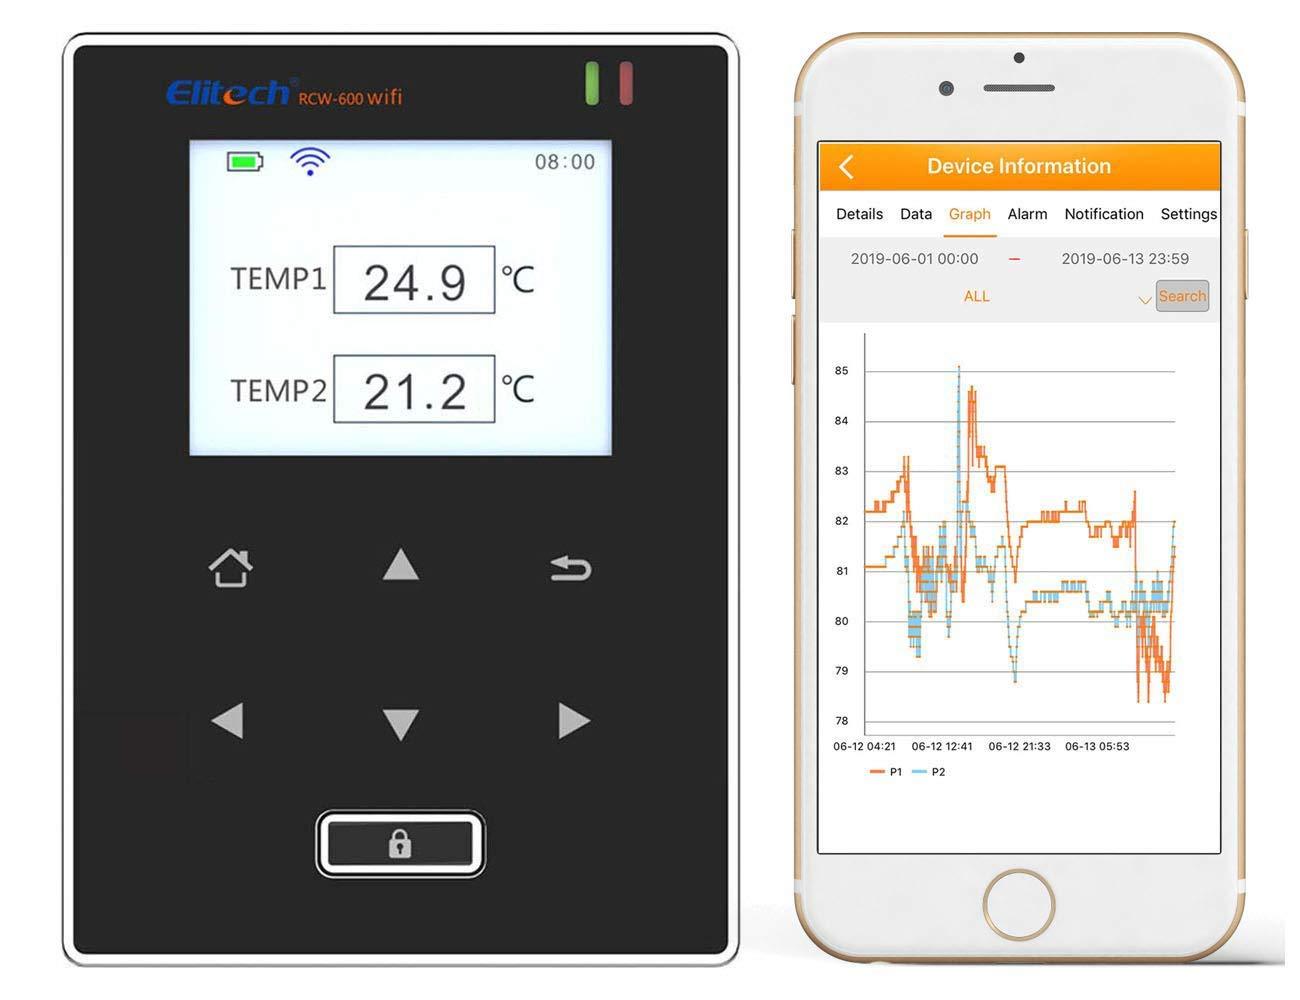 Elitech RCW-600WiFi Medidor de Temperatura de Dobles Sensores, Registrador Termometro con Sonda Externa, Alarmas por APP, Operación remota por ELITECH Cloud, para Restauración, Logística, Medicina